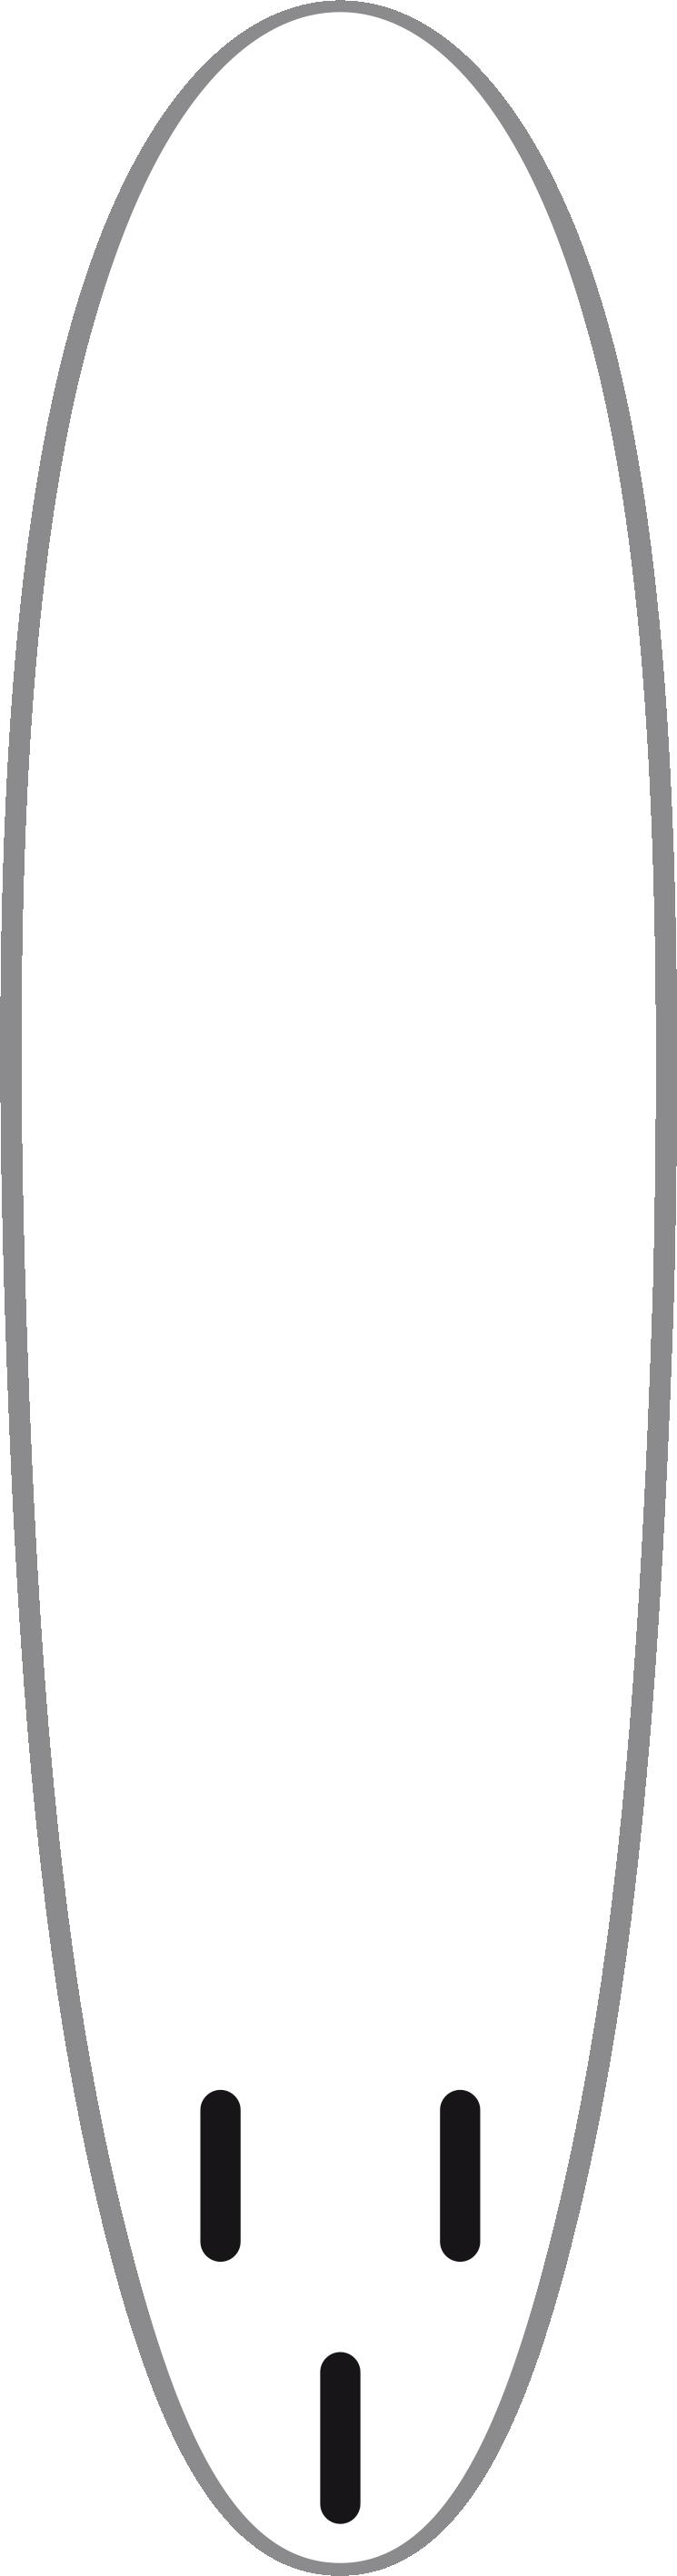 COMET - Base